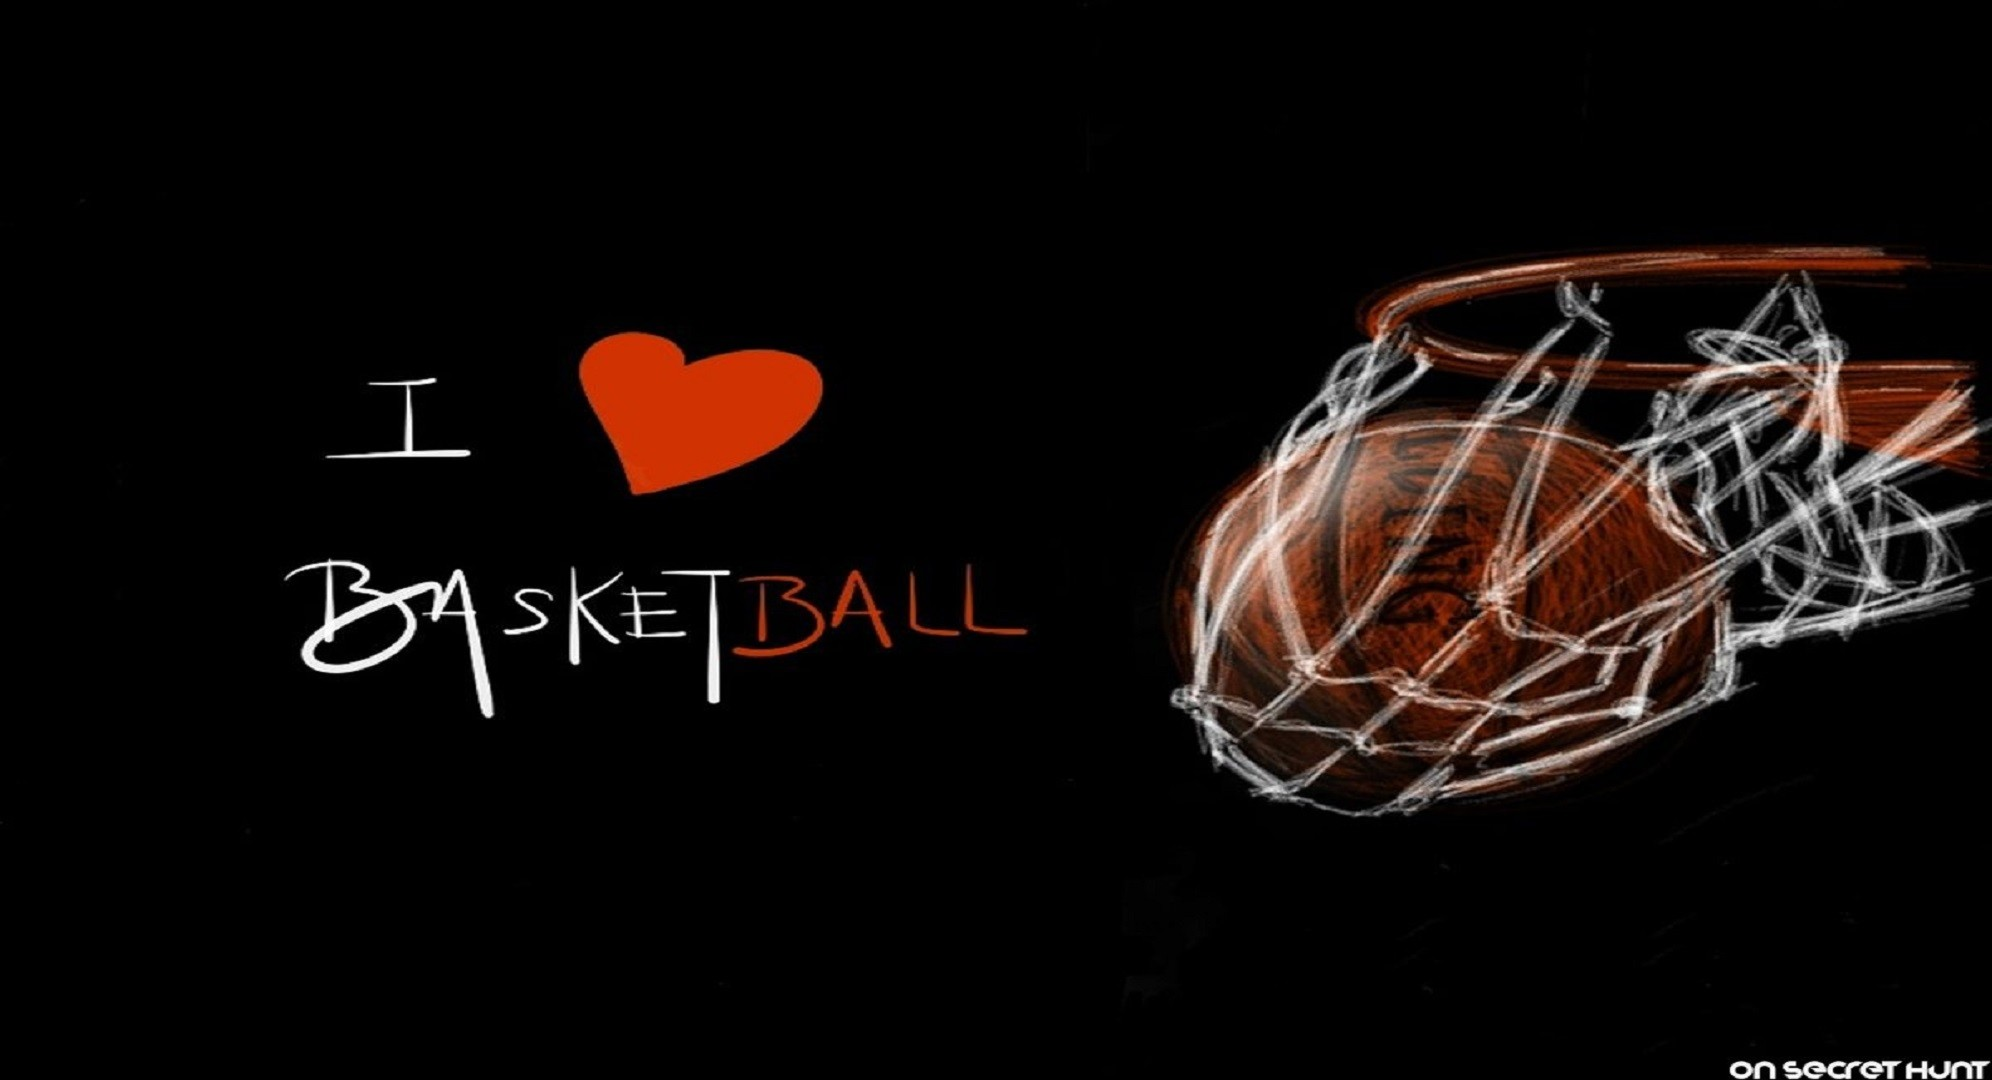 Basketball Wallpaper: Basketball Wallpapers For Girls (69+ Images